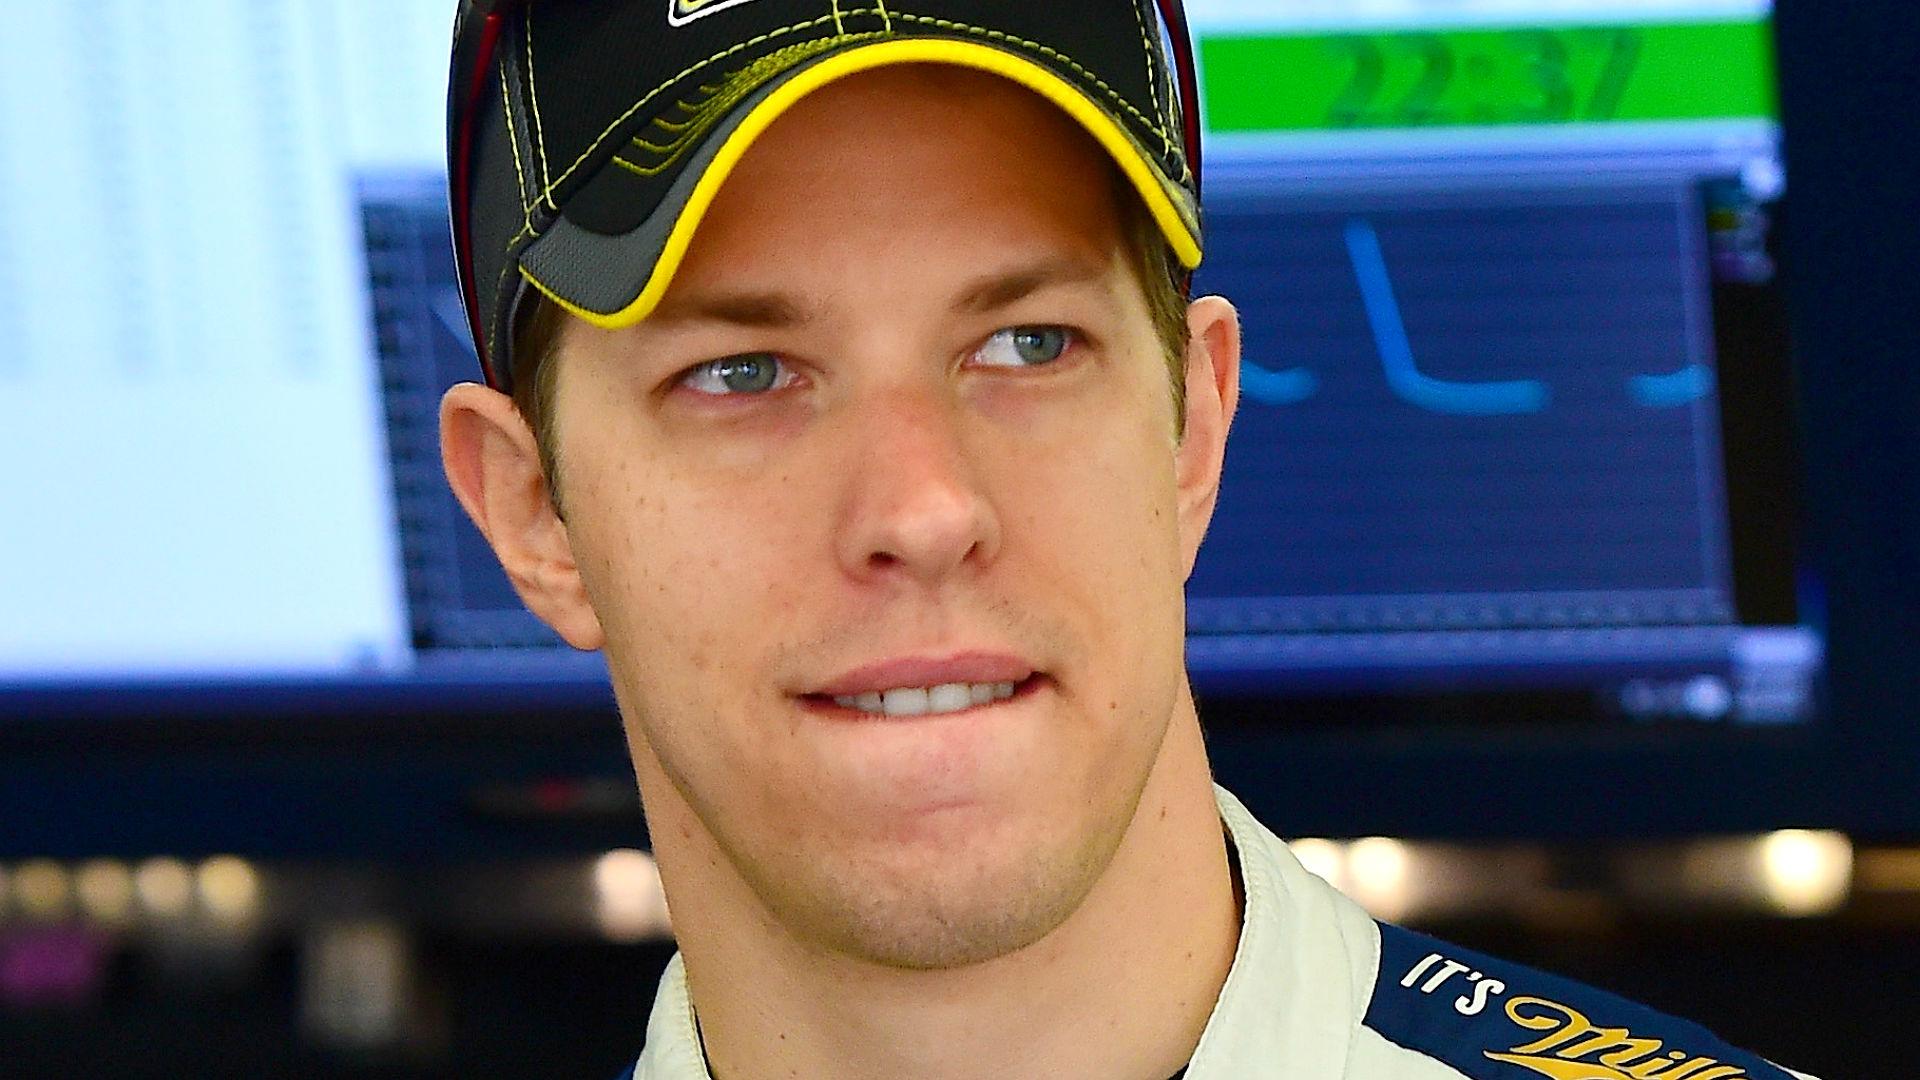 NASCAR odds and driver ratings – Keselowski tops Kansas list